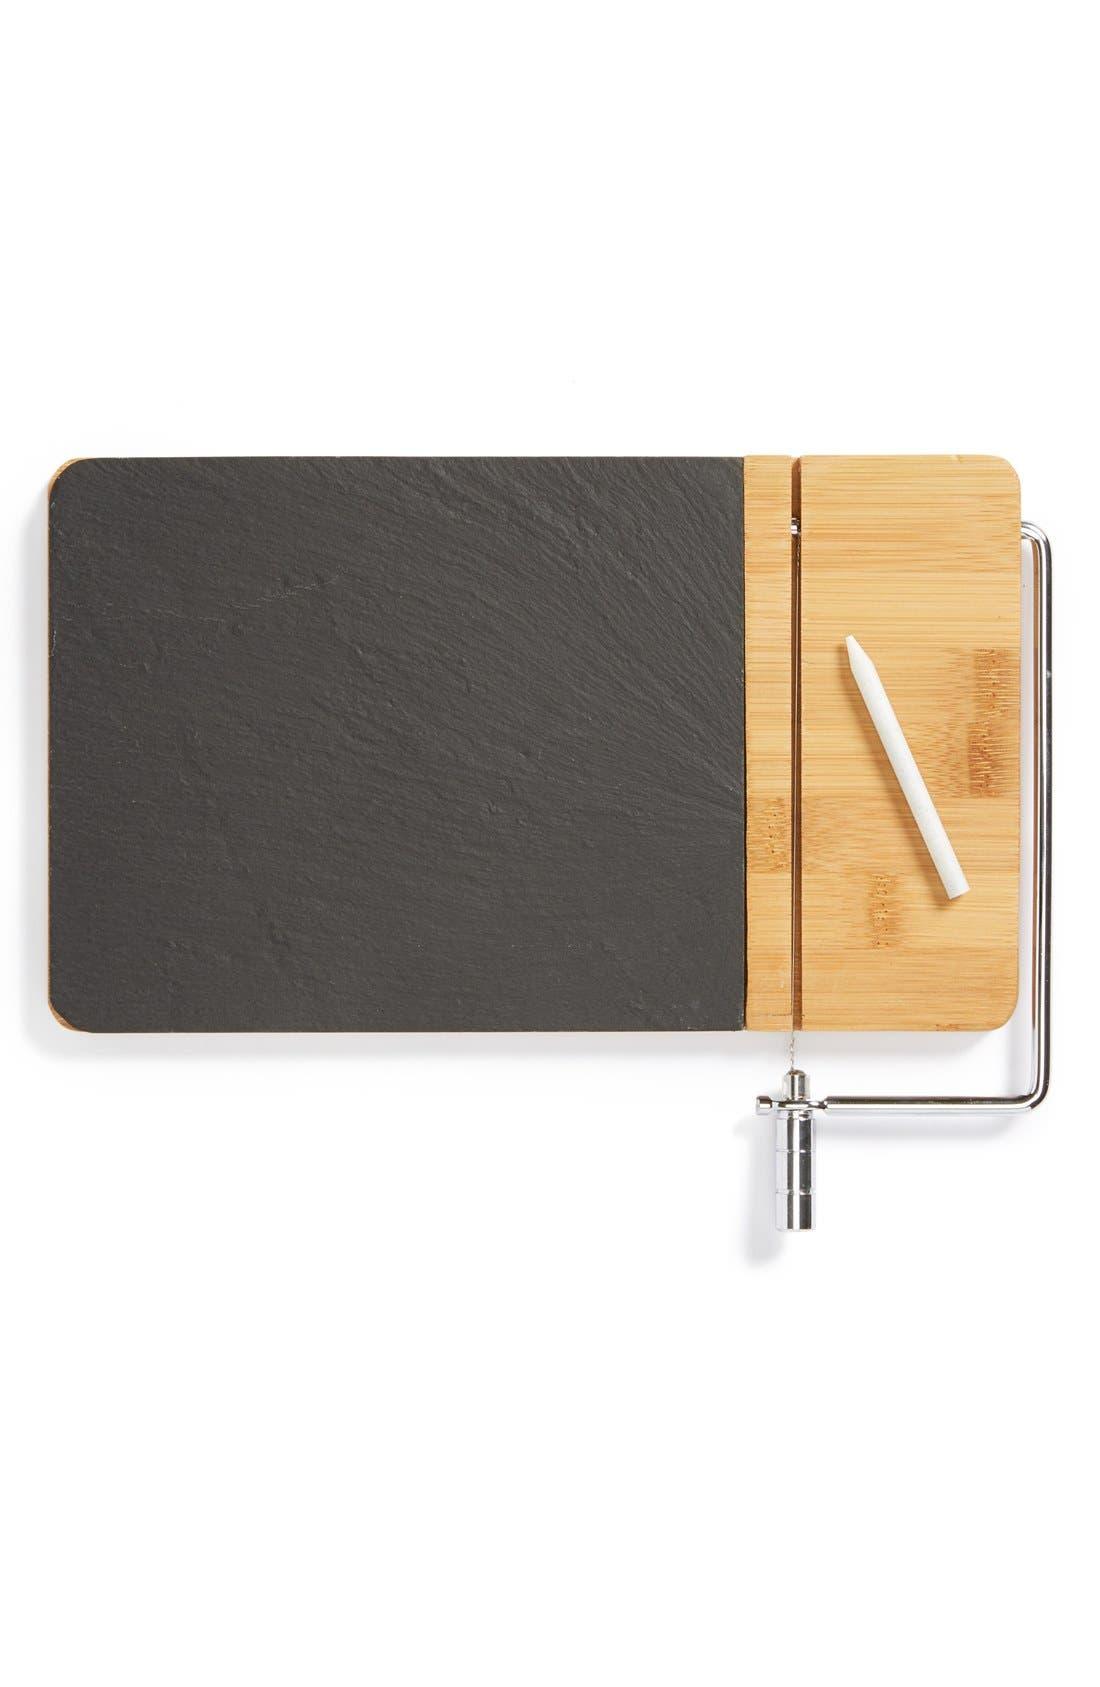 Main Image - Core Home Slate & Bamboo Cheese Board